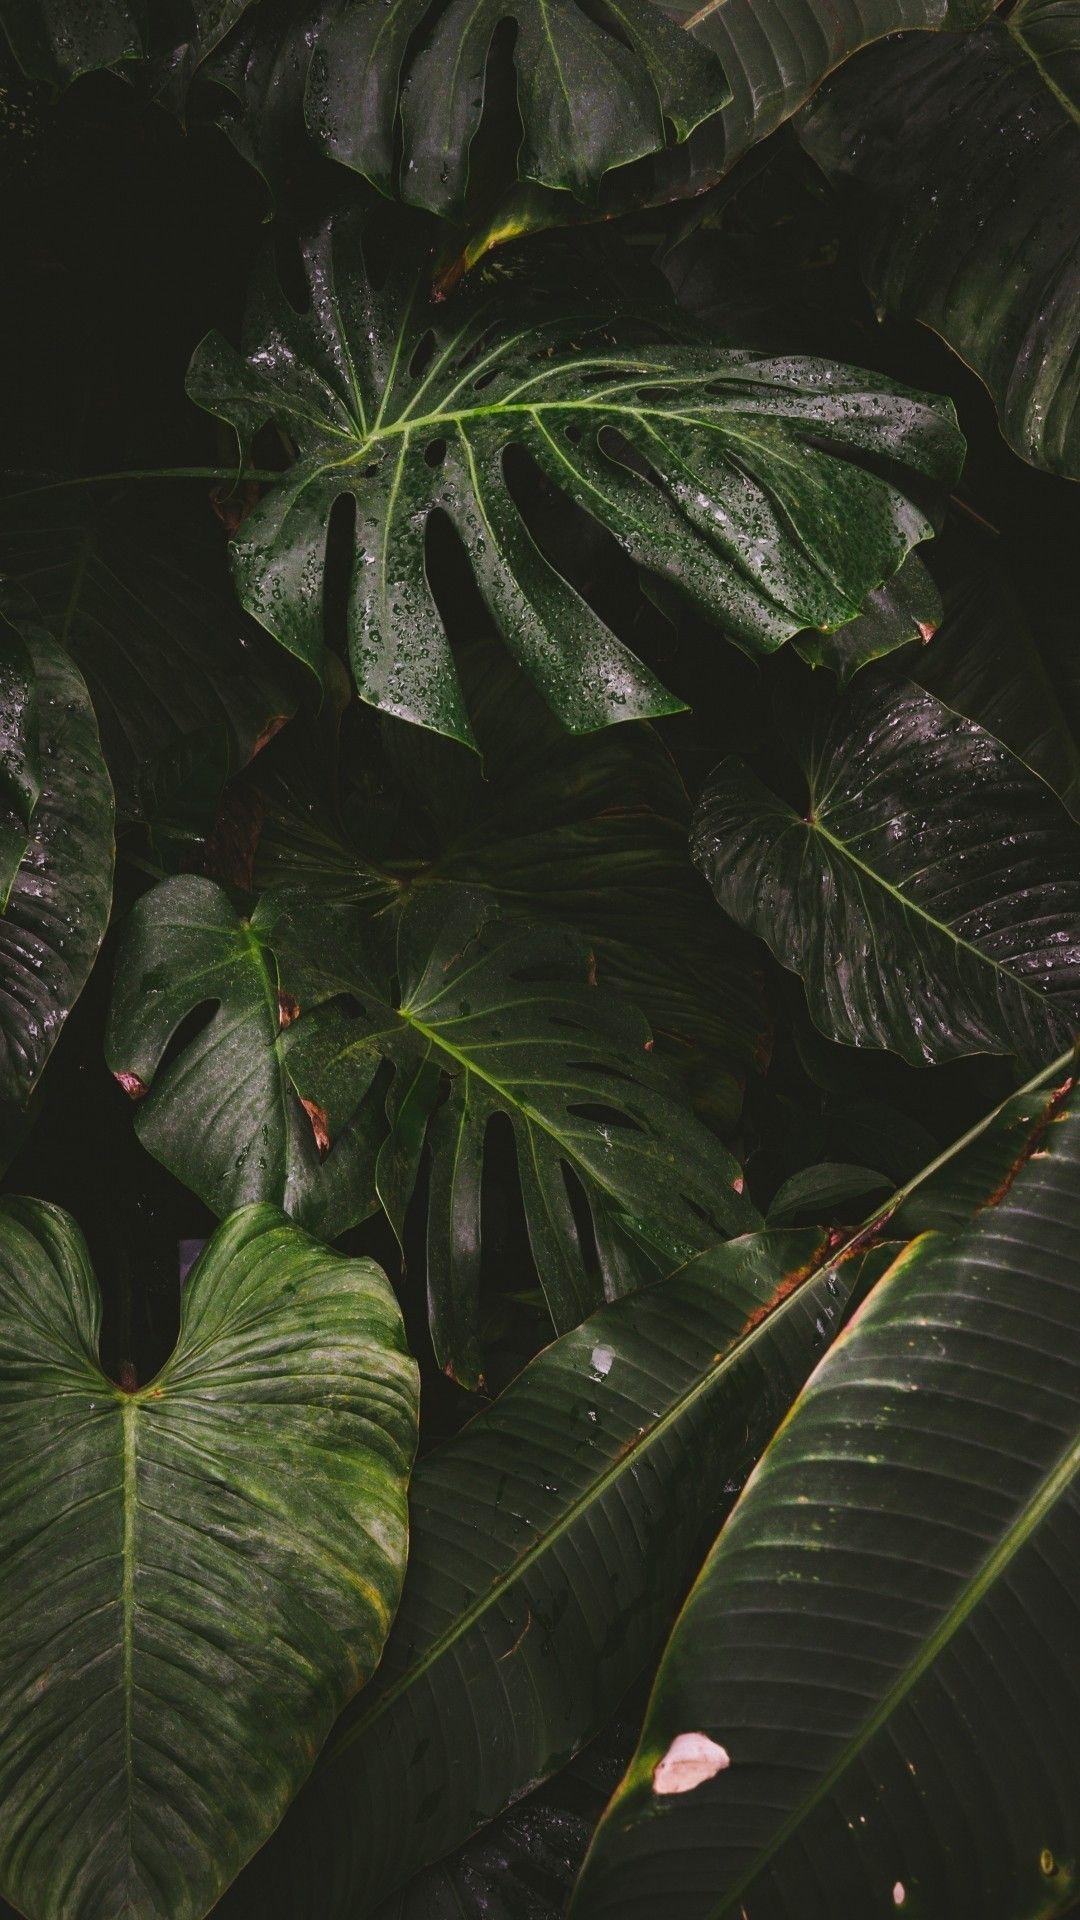 wallpaper background Bitki, Resim duvarı, Yeşil